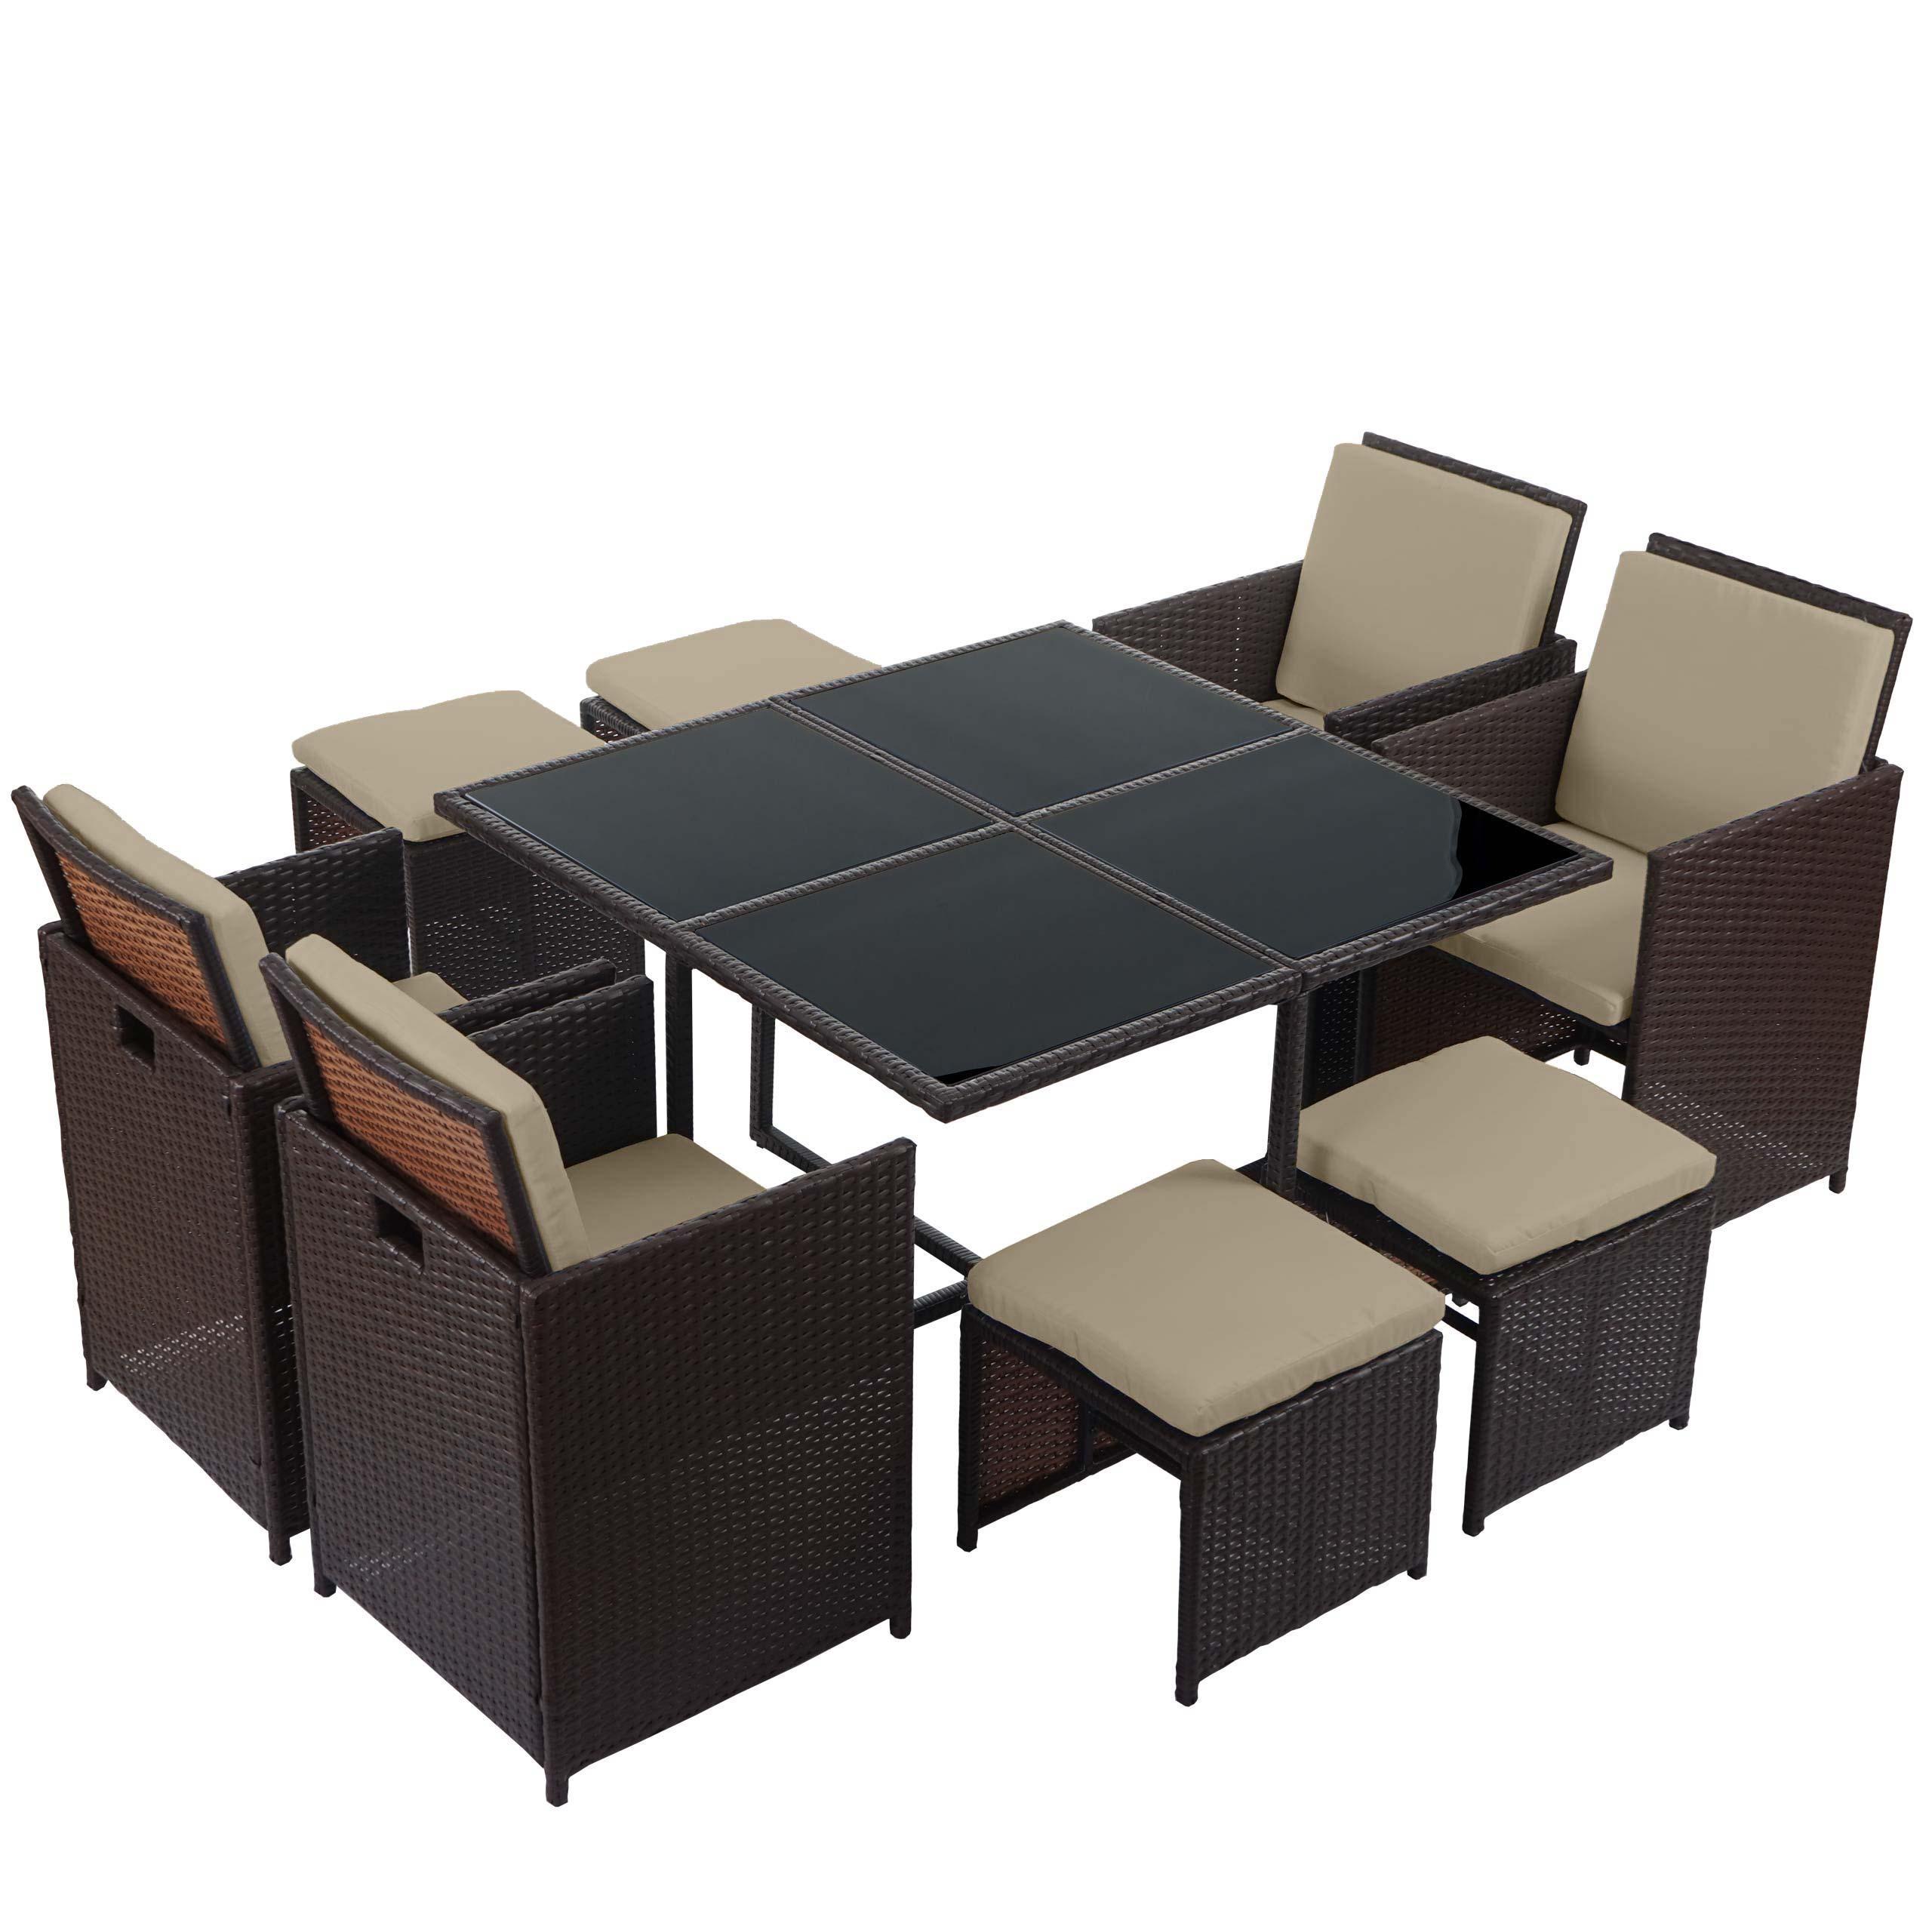 poly rattan garten garnitur kreta lounge set sitzgruppe 4 st hle braun kissen beige. Black Bedroom Furniture Sets. Home Design Ideas